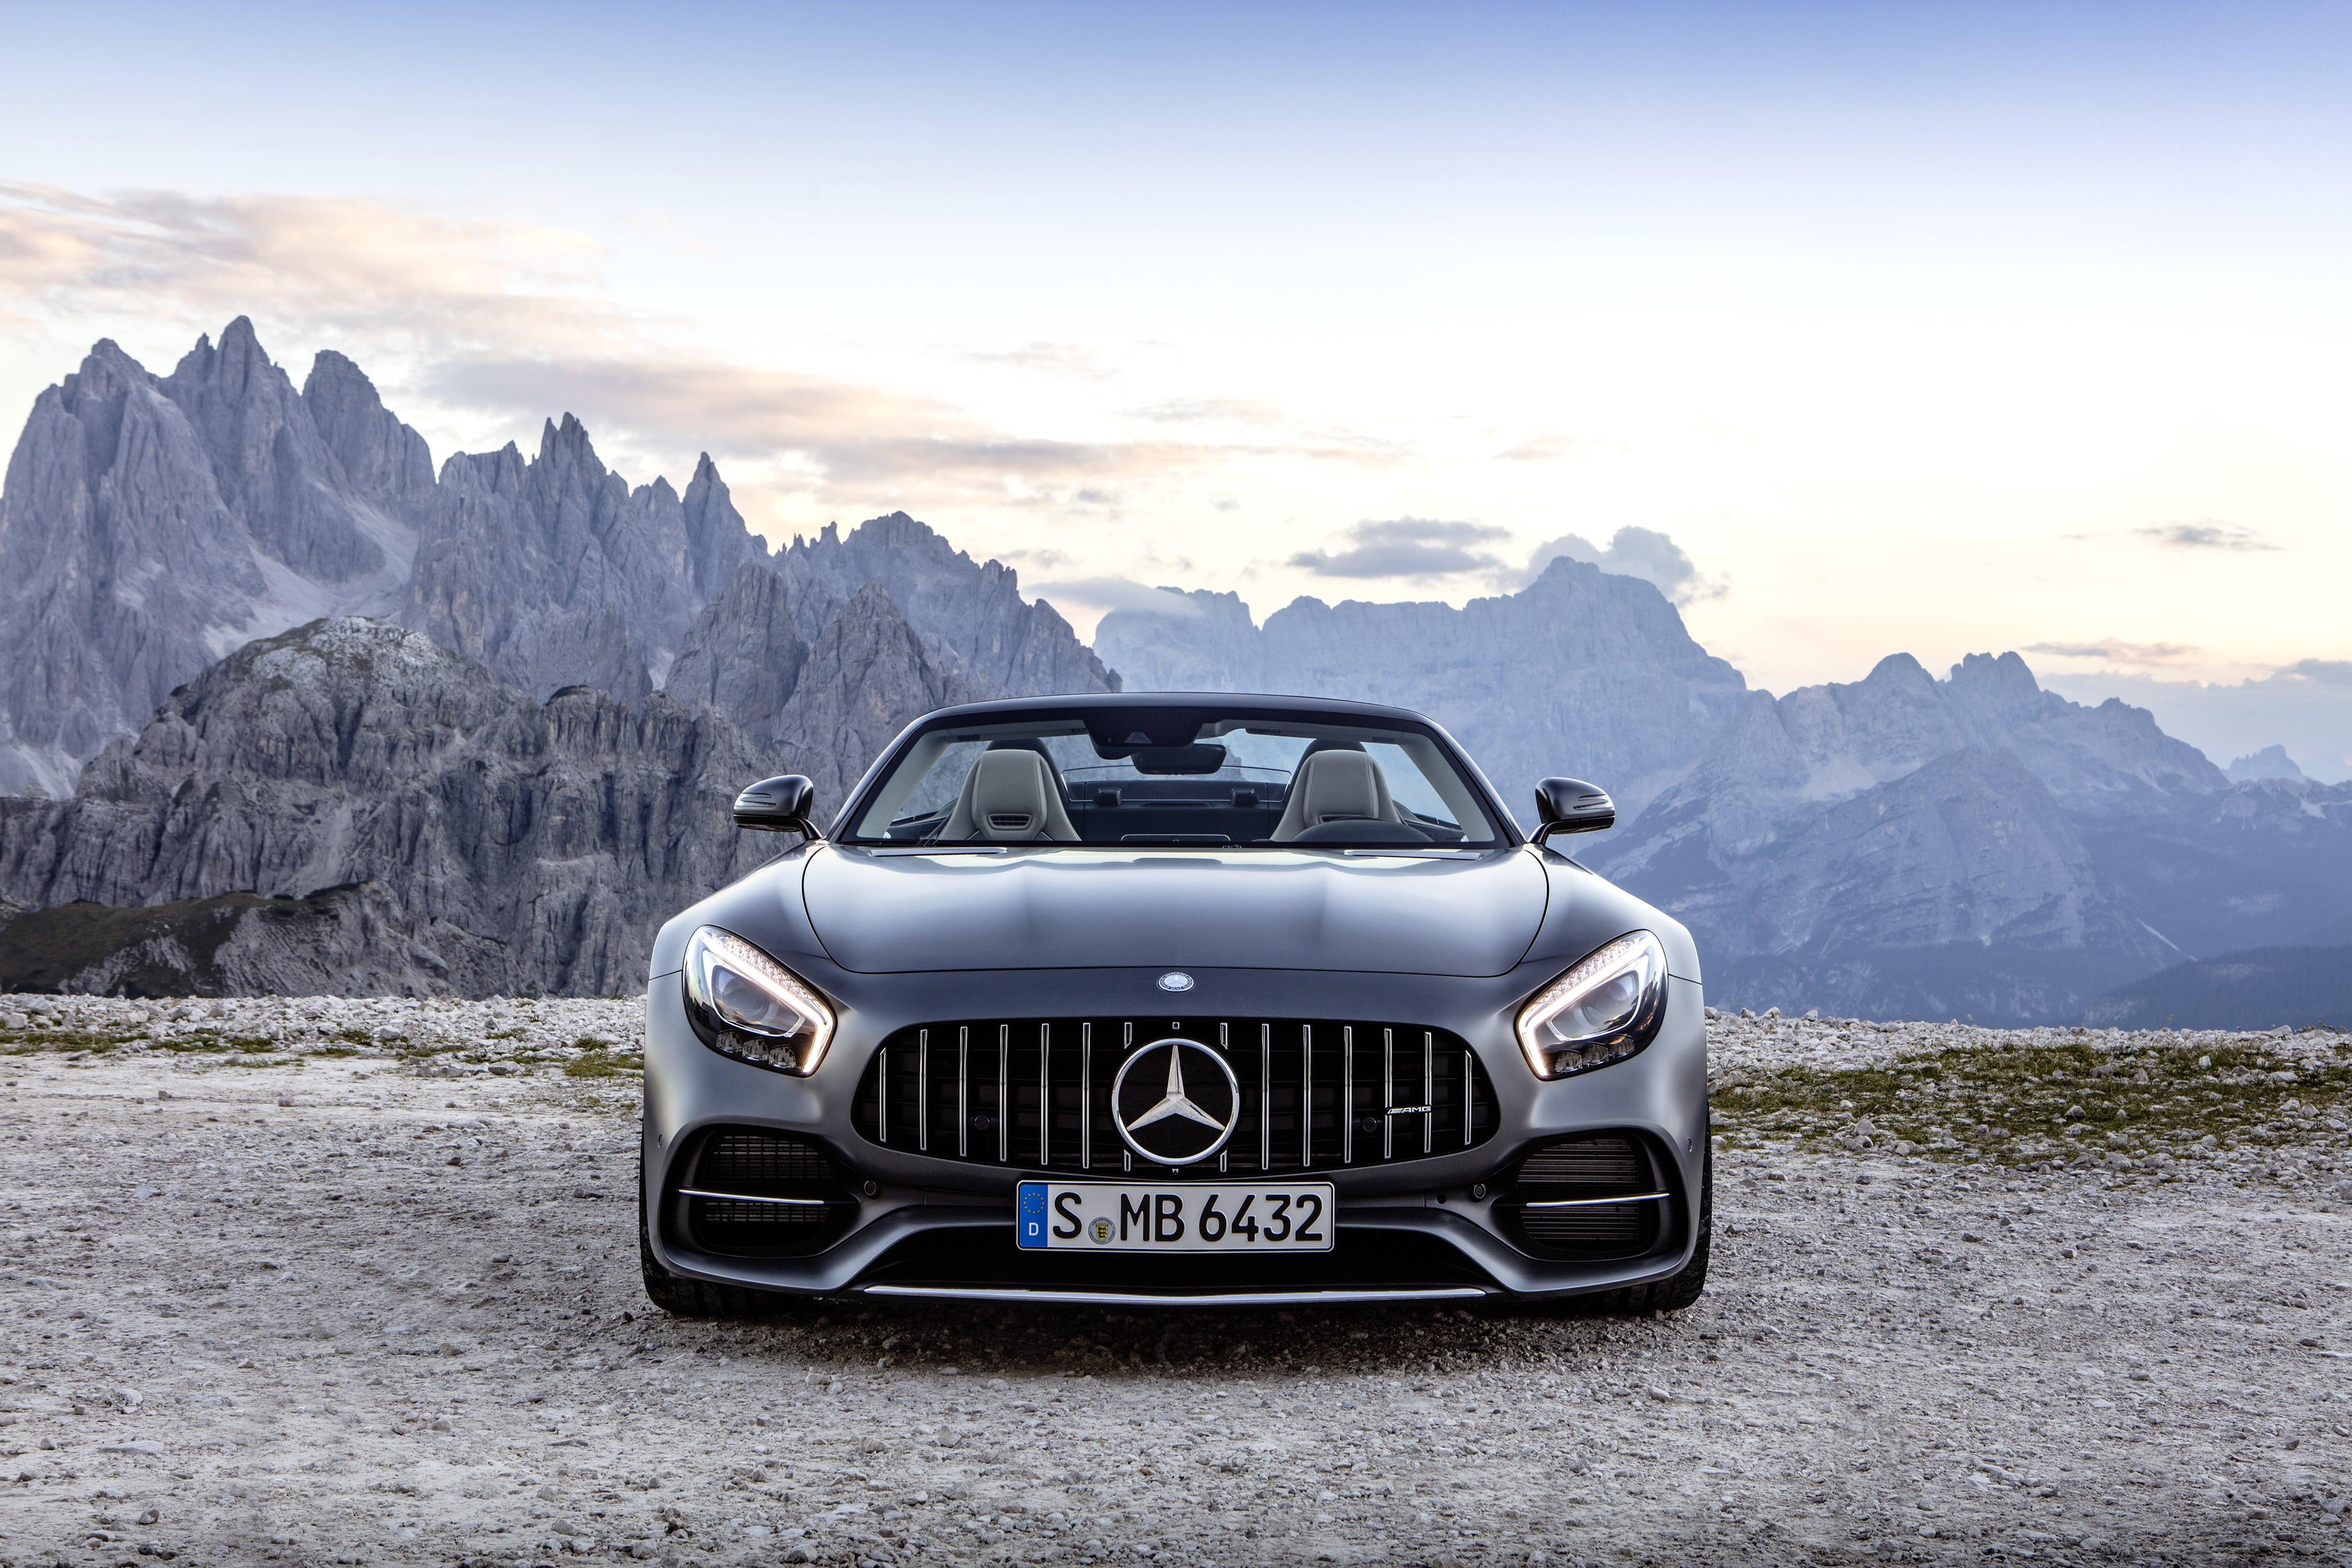 Mercedes-AMG GT Roadster Widescreen